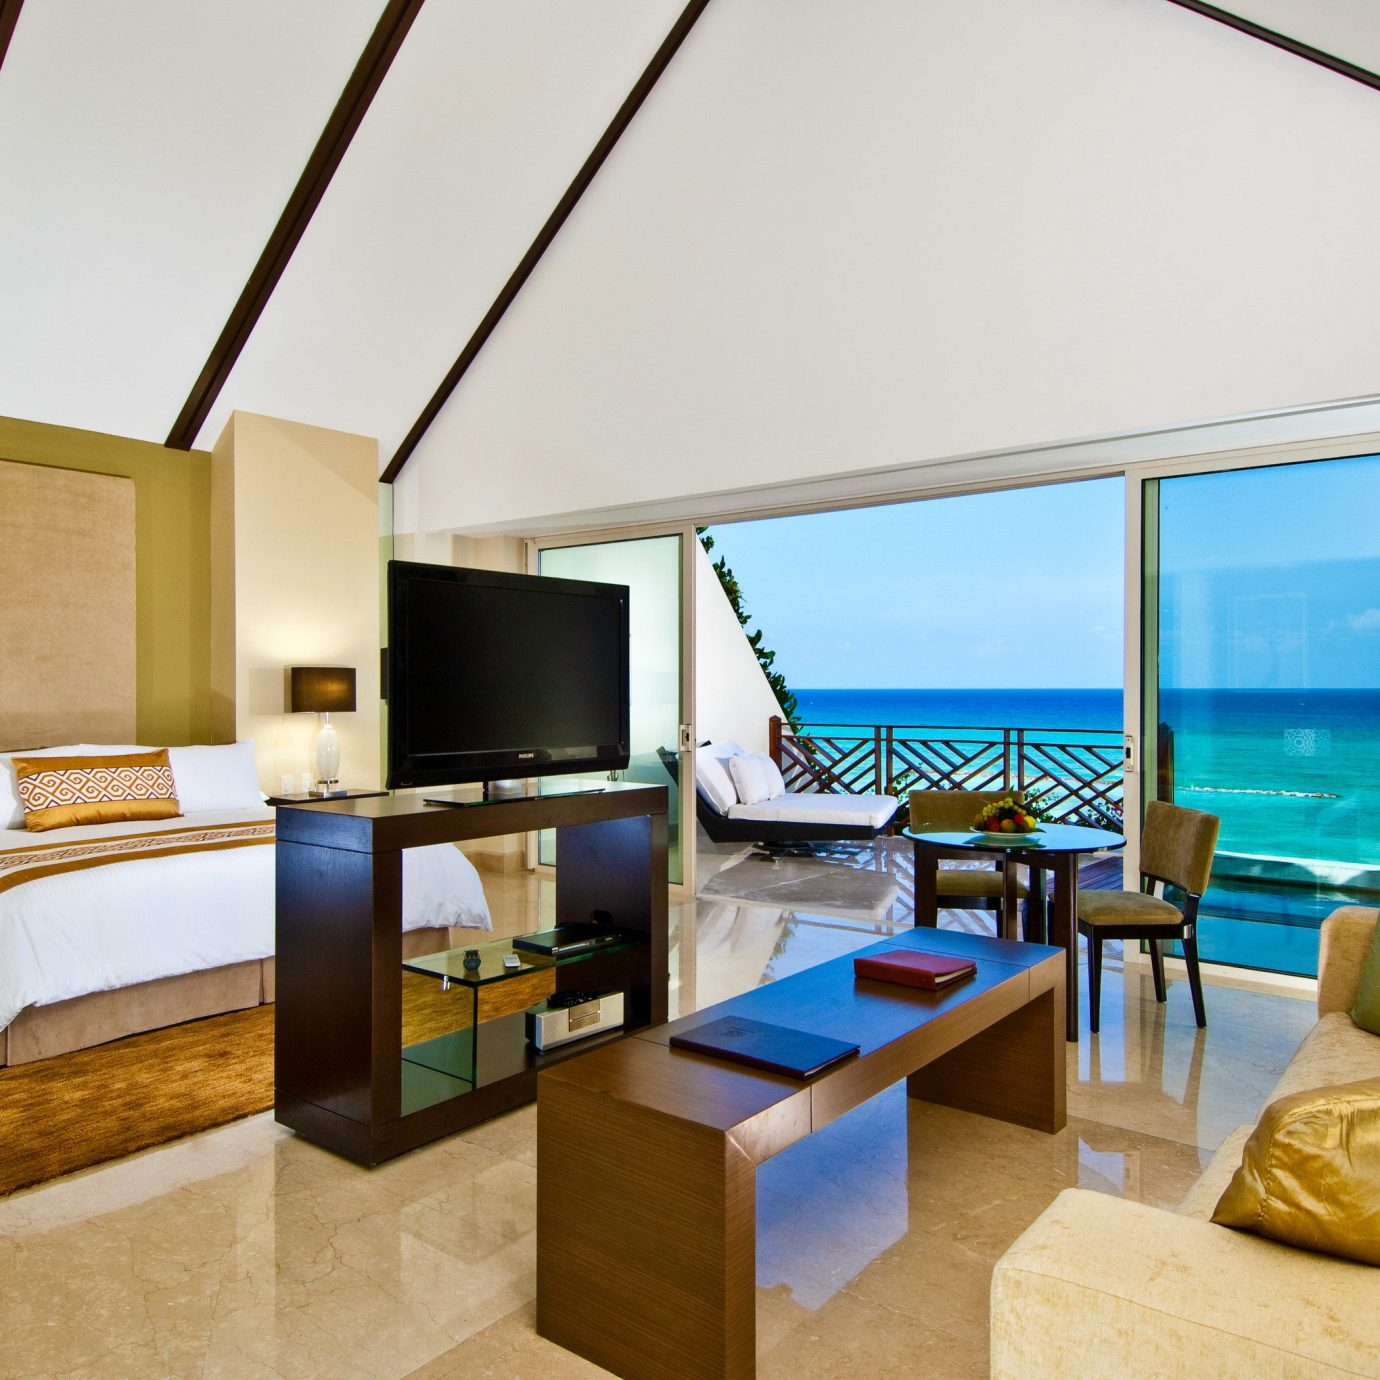 Suite living room Resort penthouse apartment interior designer Bedroom Modern